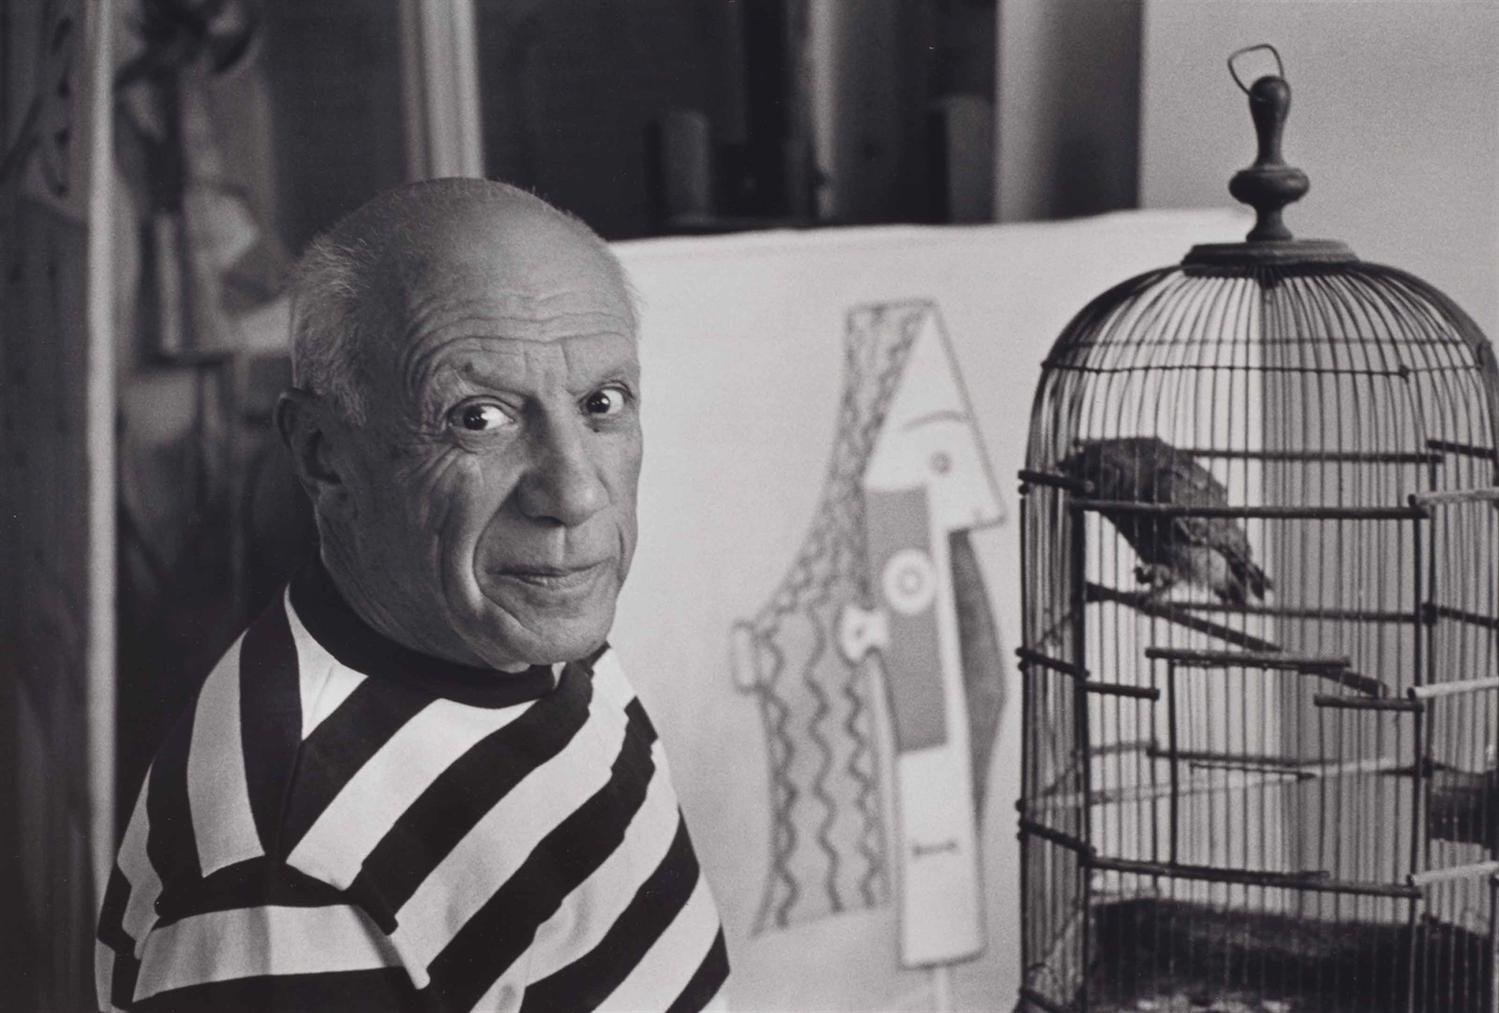 Rene Burri-Pablo Picasso, Villa ' Californie', Le Cannet, France-1957